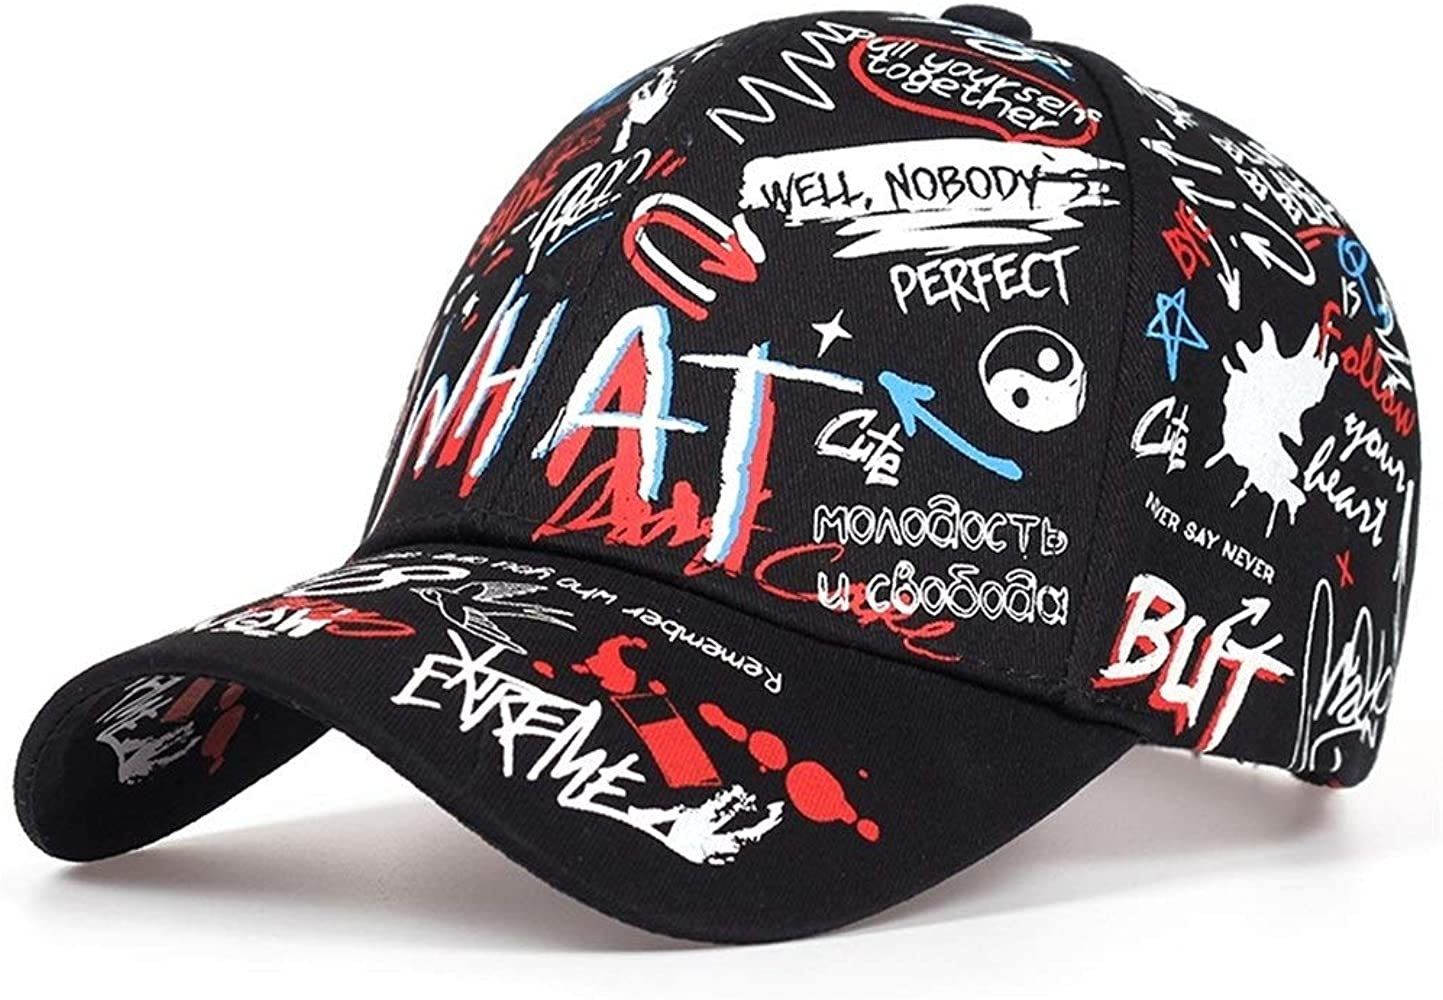 Battle Of The Peak Gorra de Beisbol Moda Graffiti Impresión Gorra ...